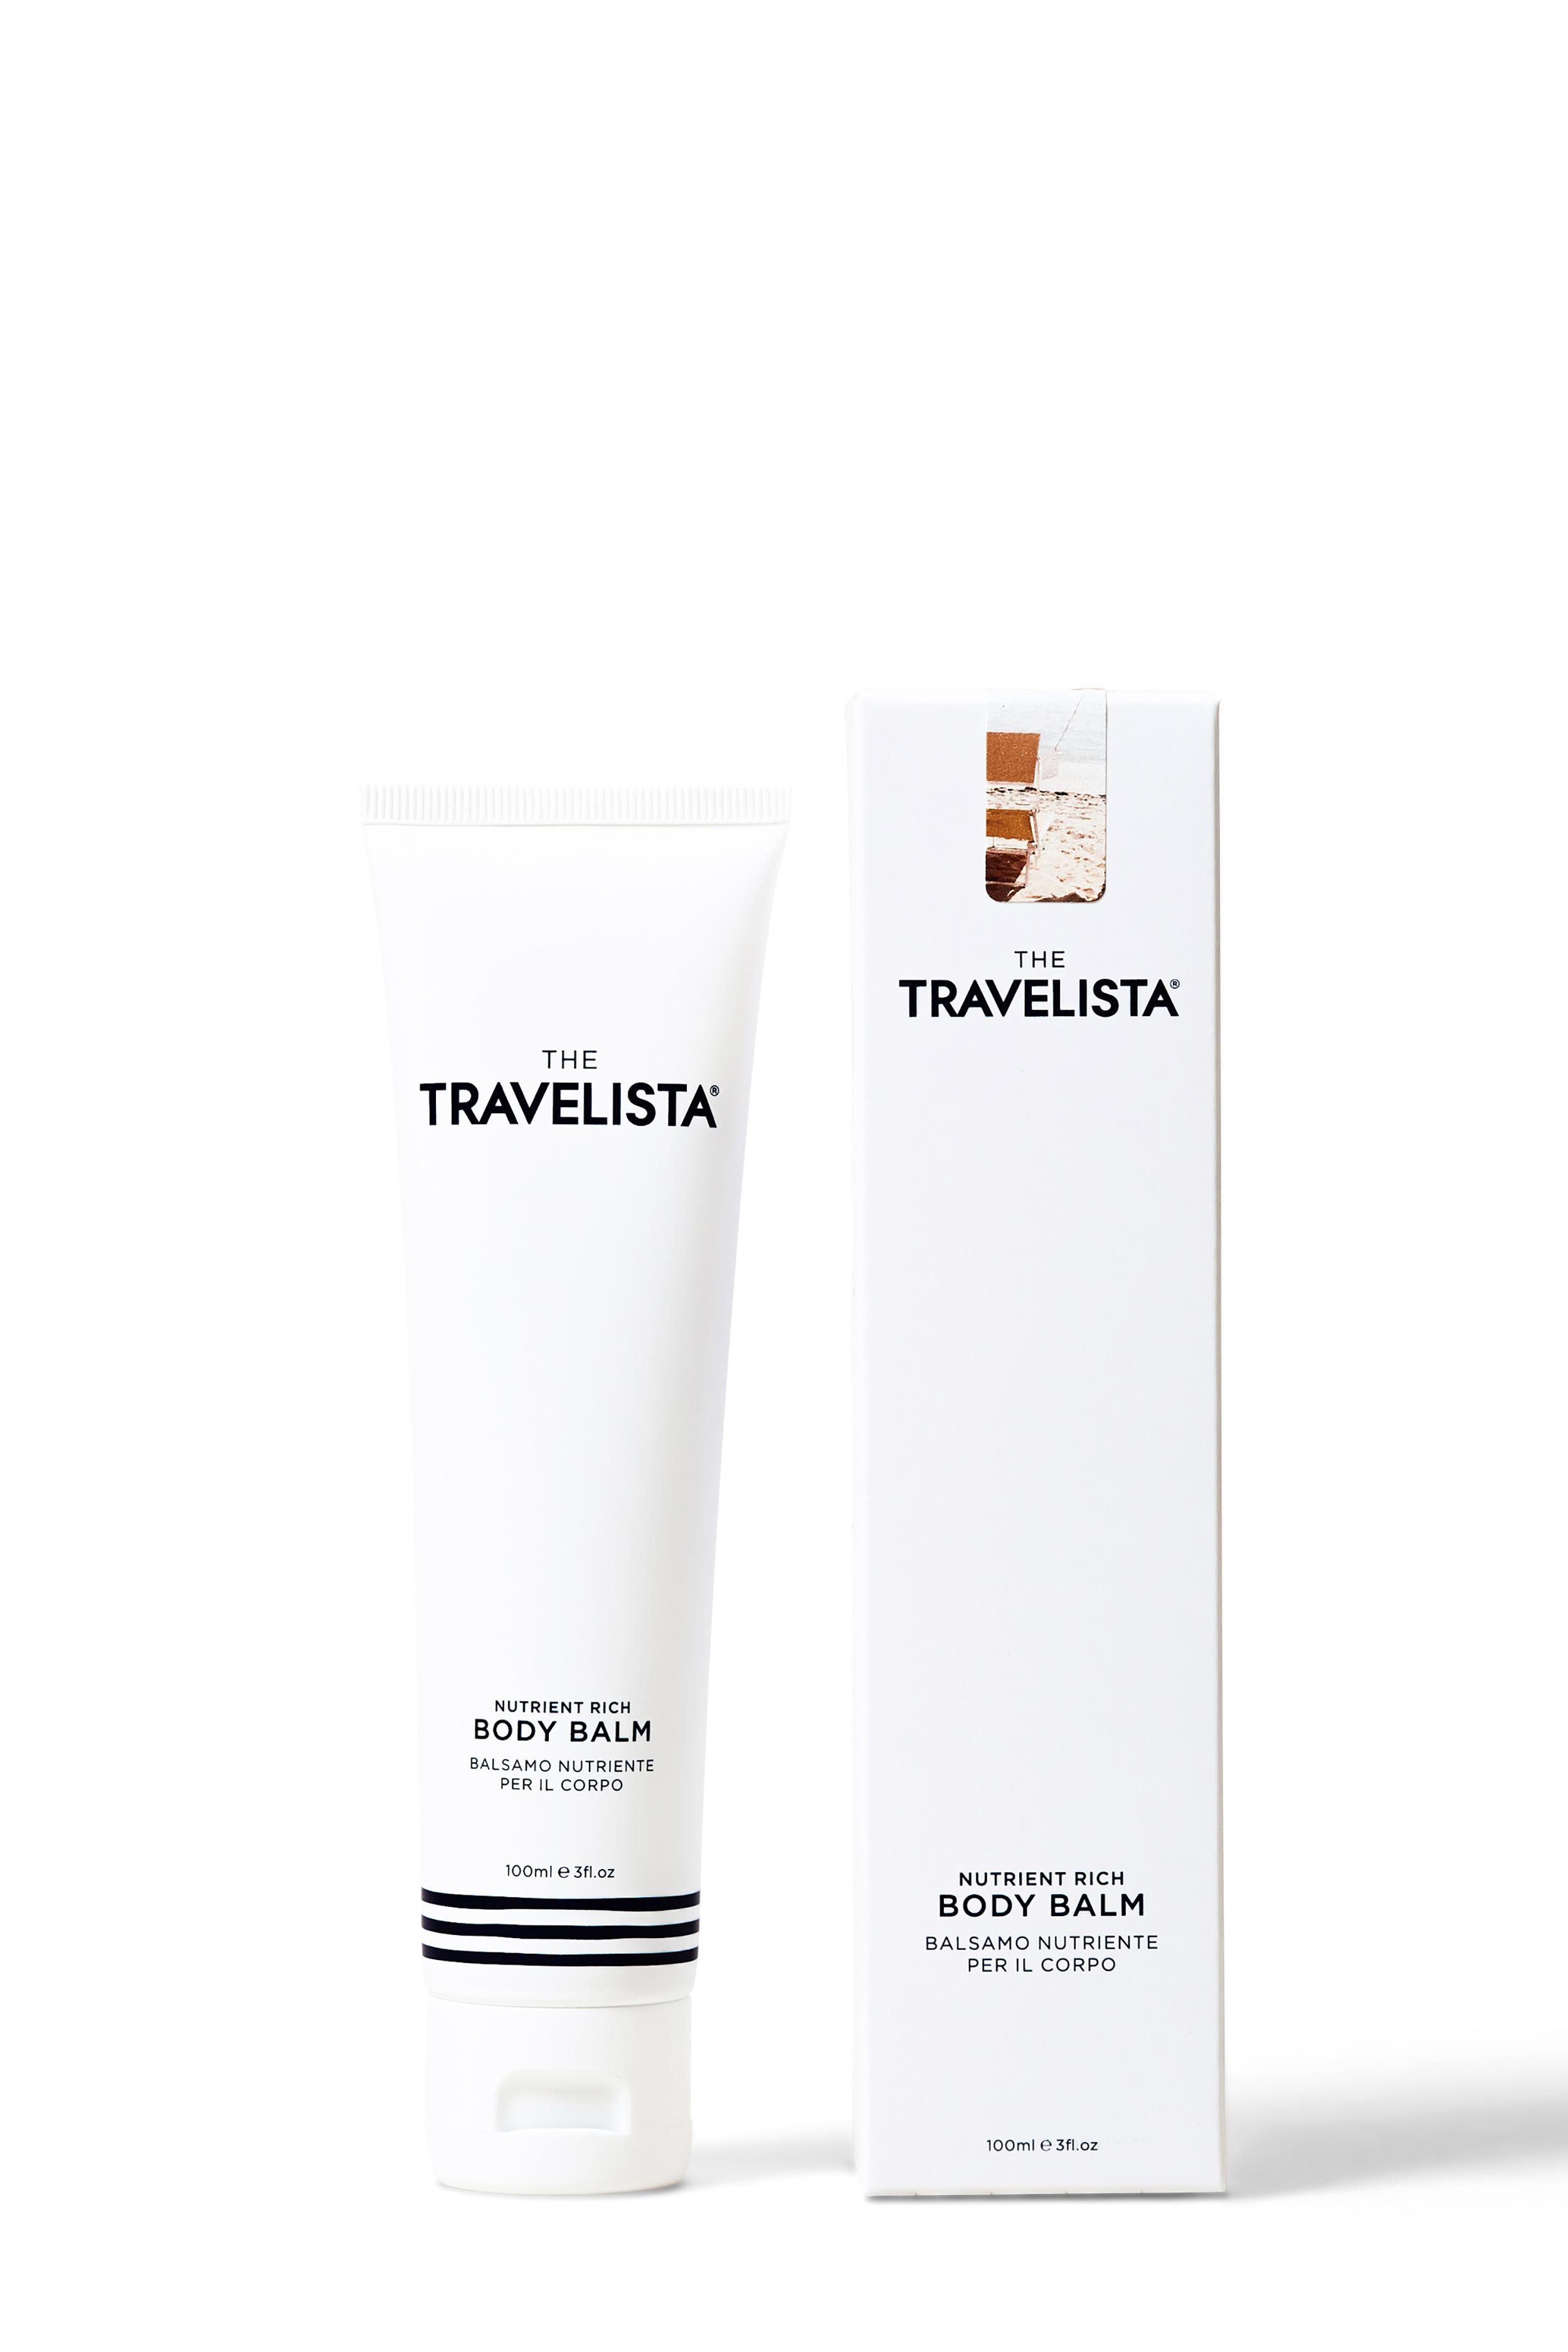 The Travelista body balm